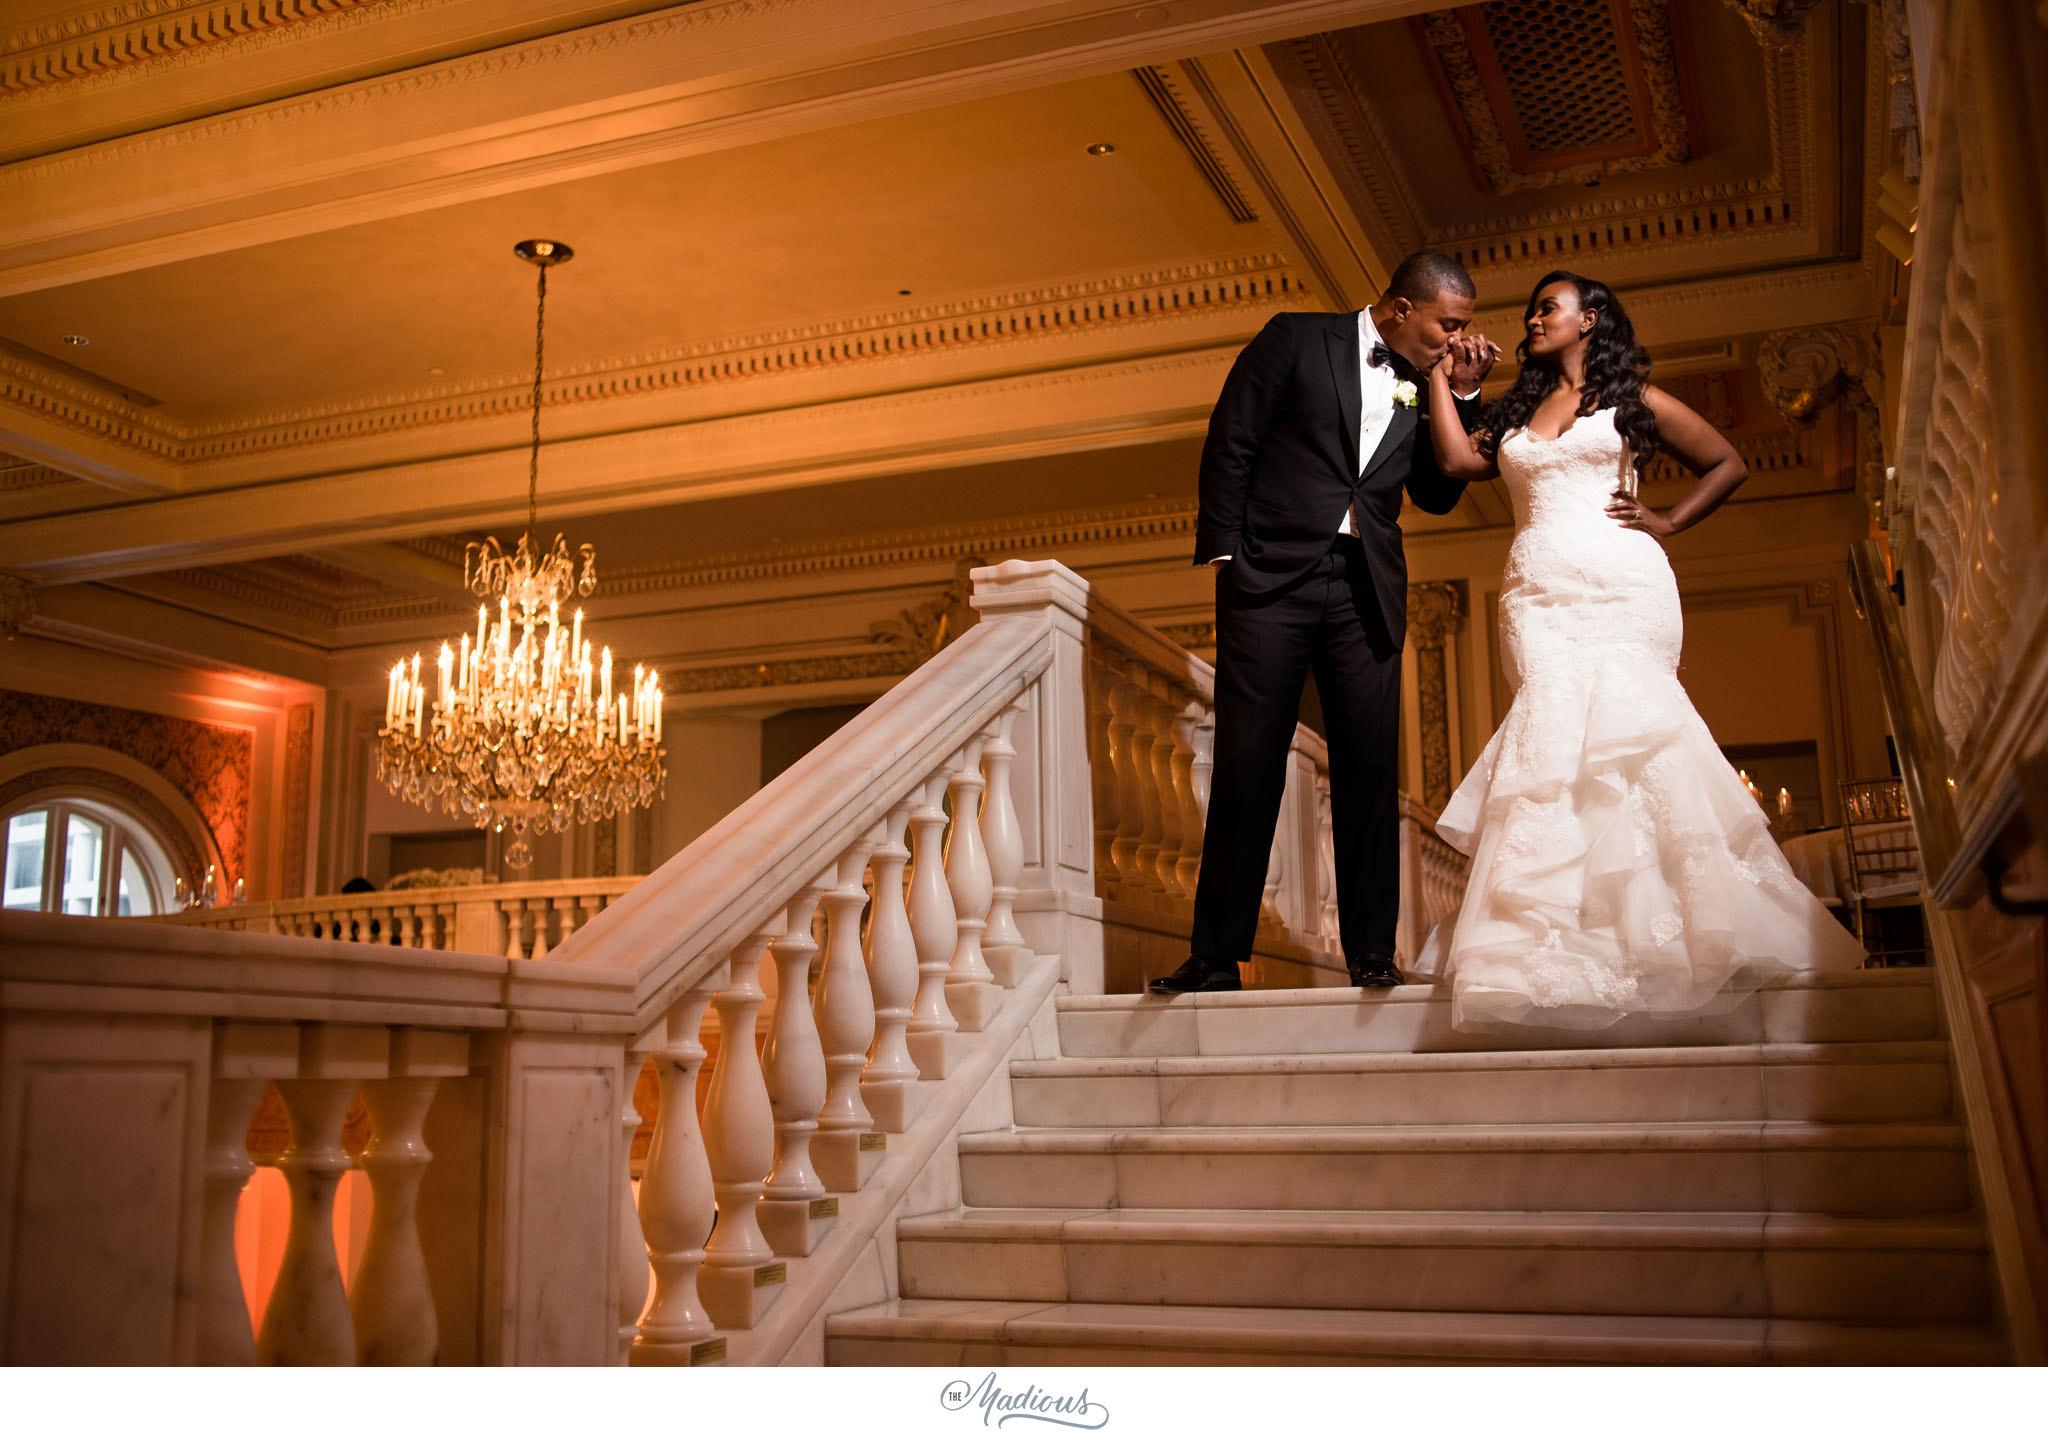 nmwa+wedding,+women+in+the+arts+wedding,+ethiopian+wedding,+dc+wedding+0163.jpg